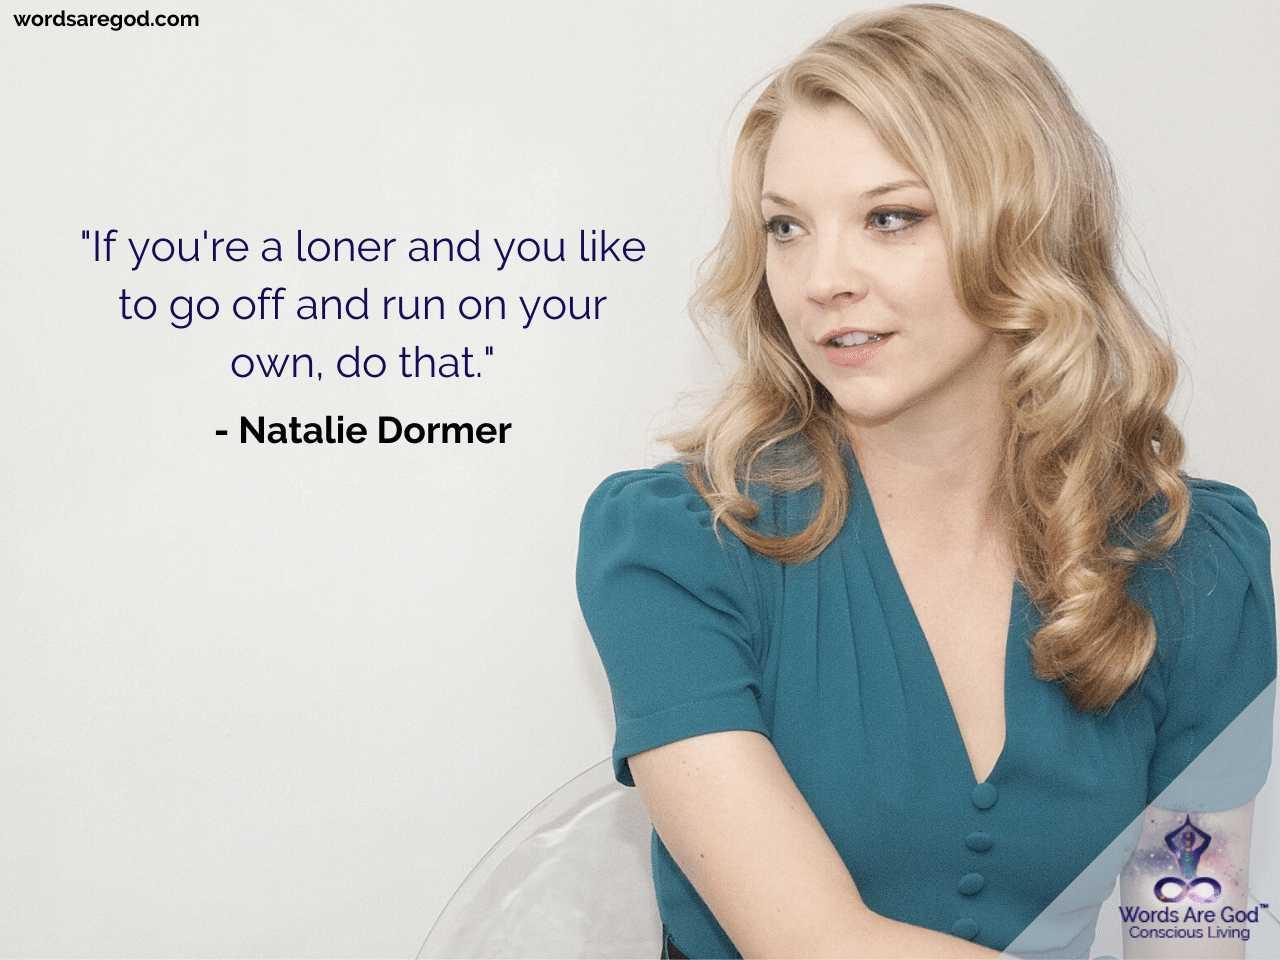 Natalie Dormer Best Quotes by Natalie Dormer